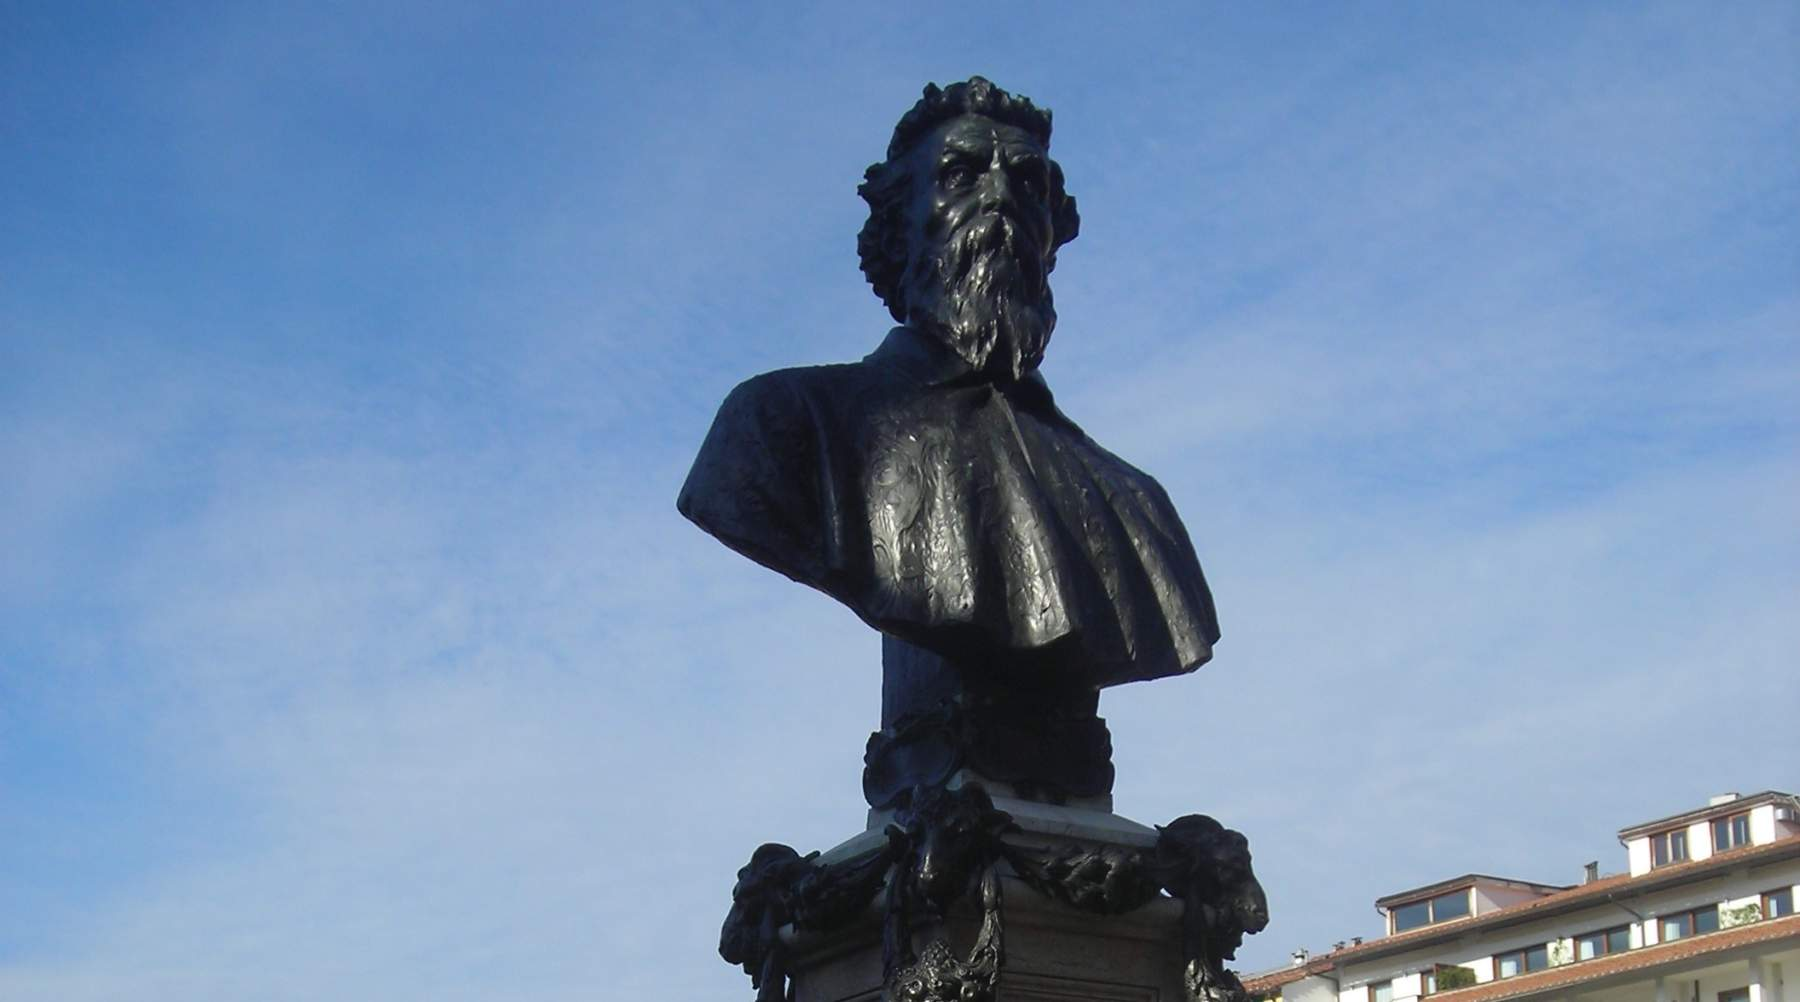 La fontana sul Ponte Vecchio